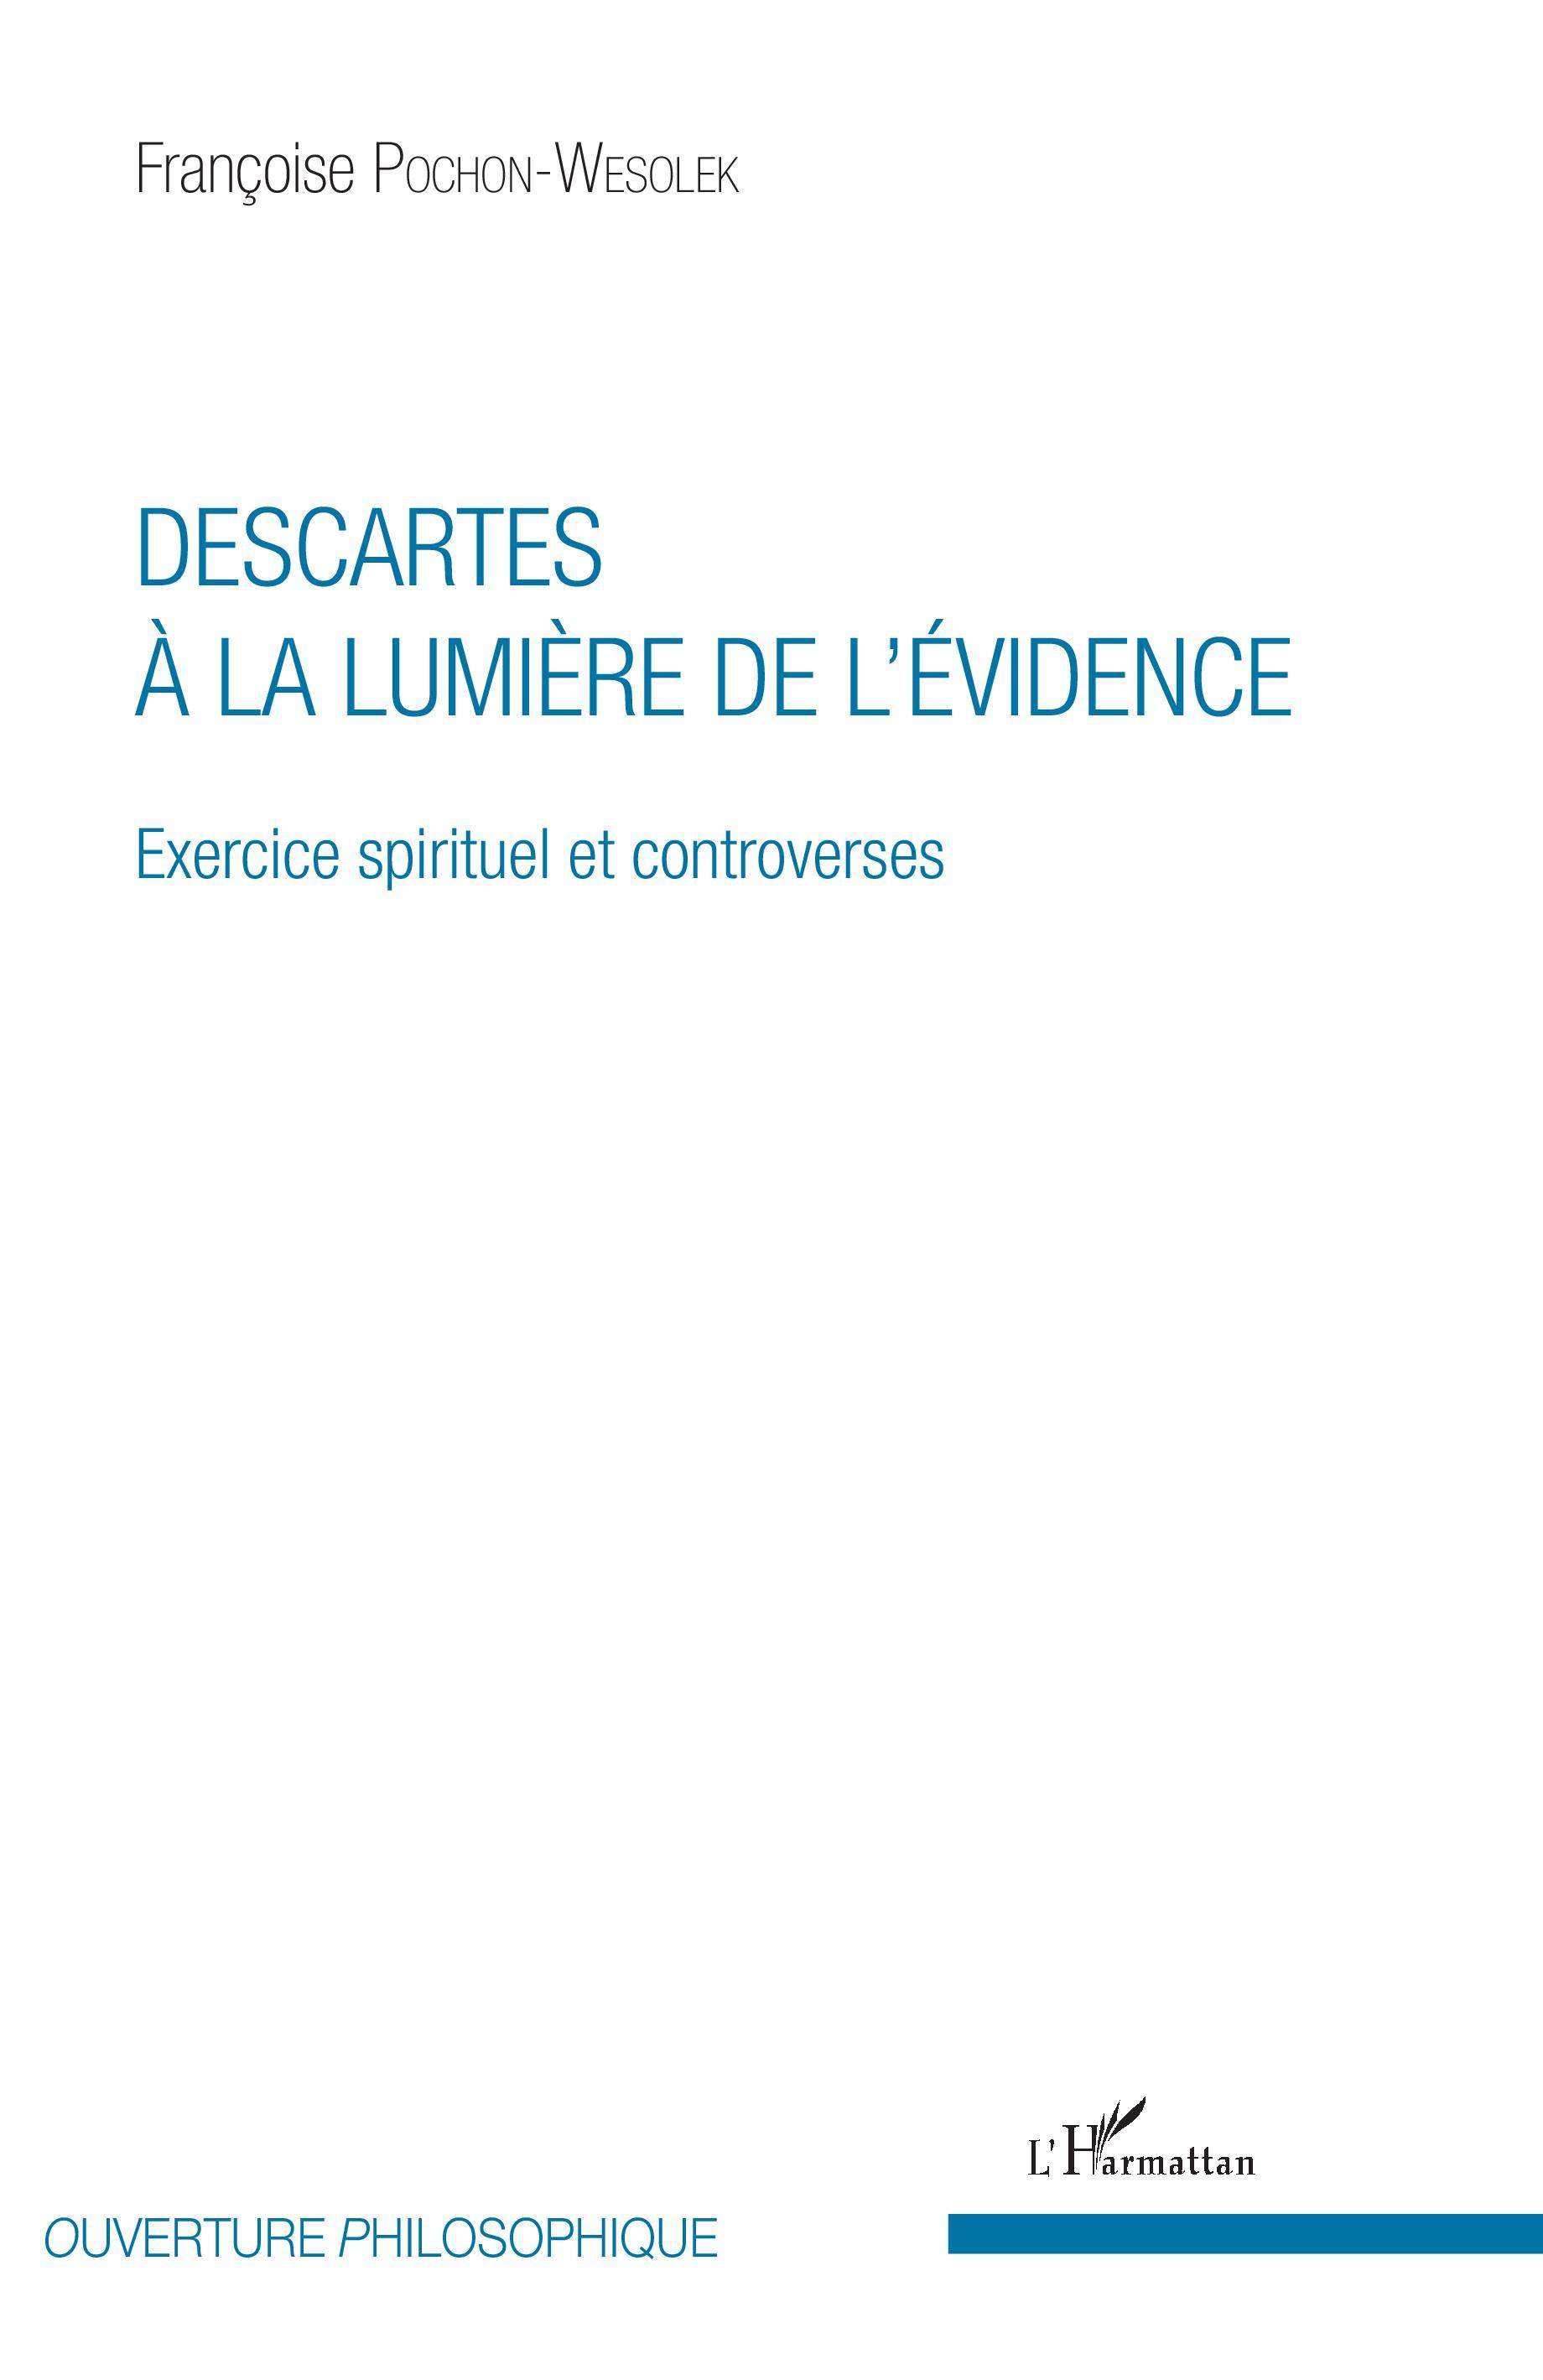 pochon_descartes_a_la_lumiere_de_l_evidence-2.jpg